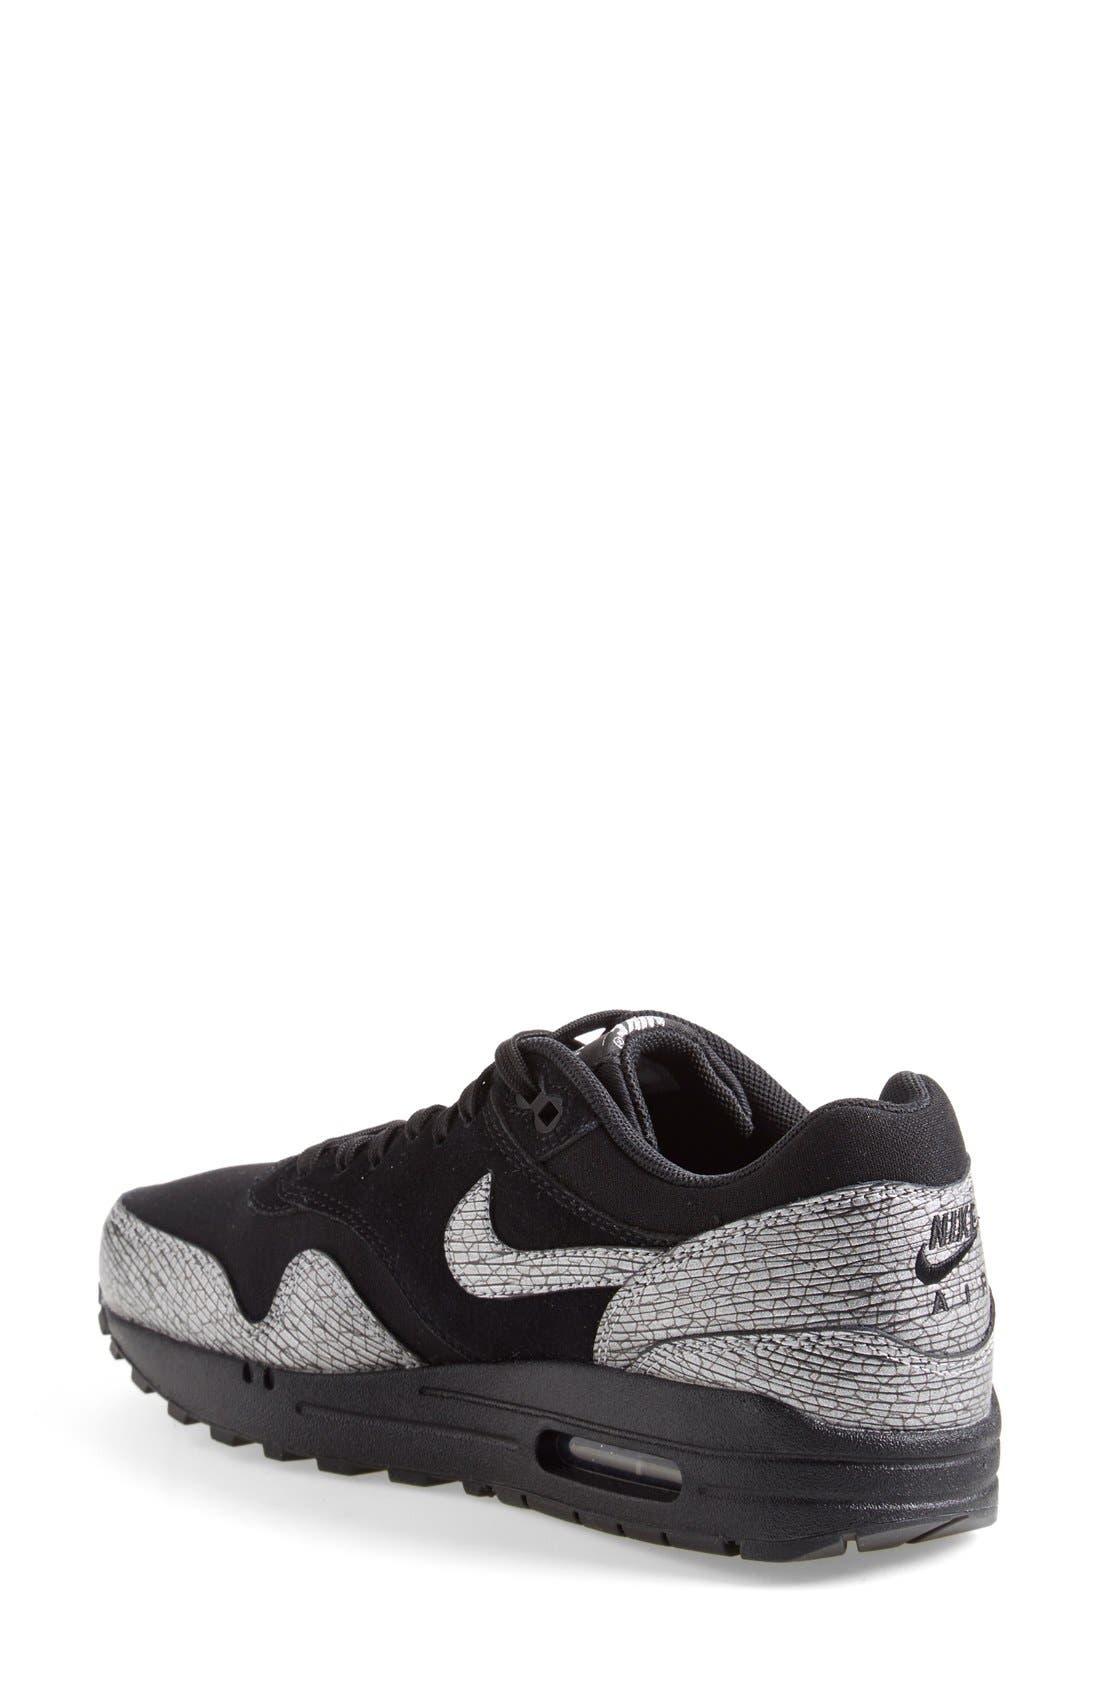 NIKE, 'Air Max 1 Vintage' Sneakers, Alternate thumbnail 2, color, 005